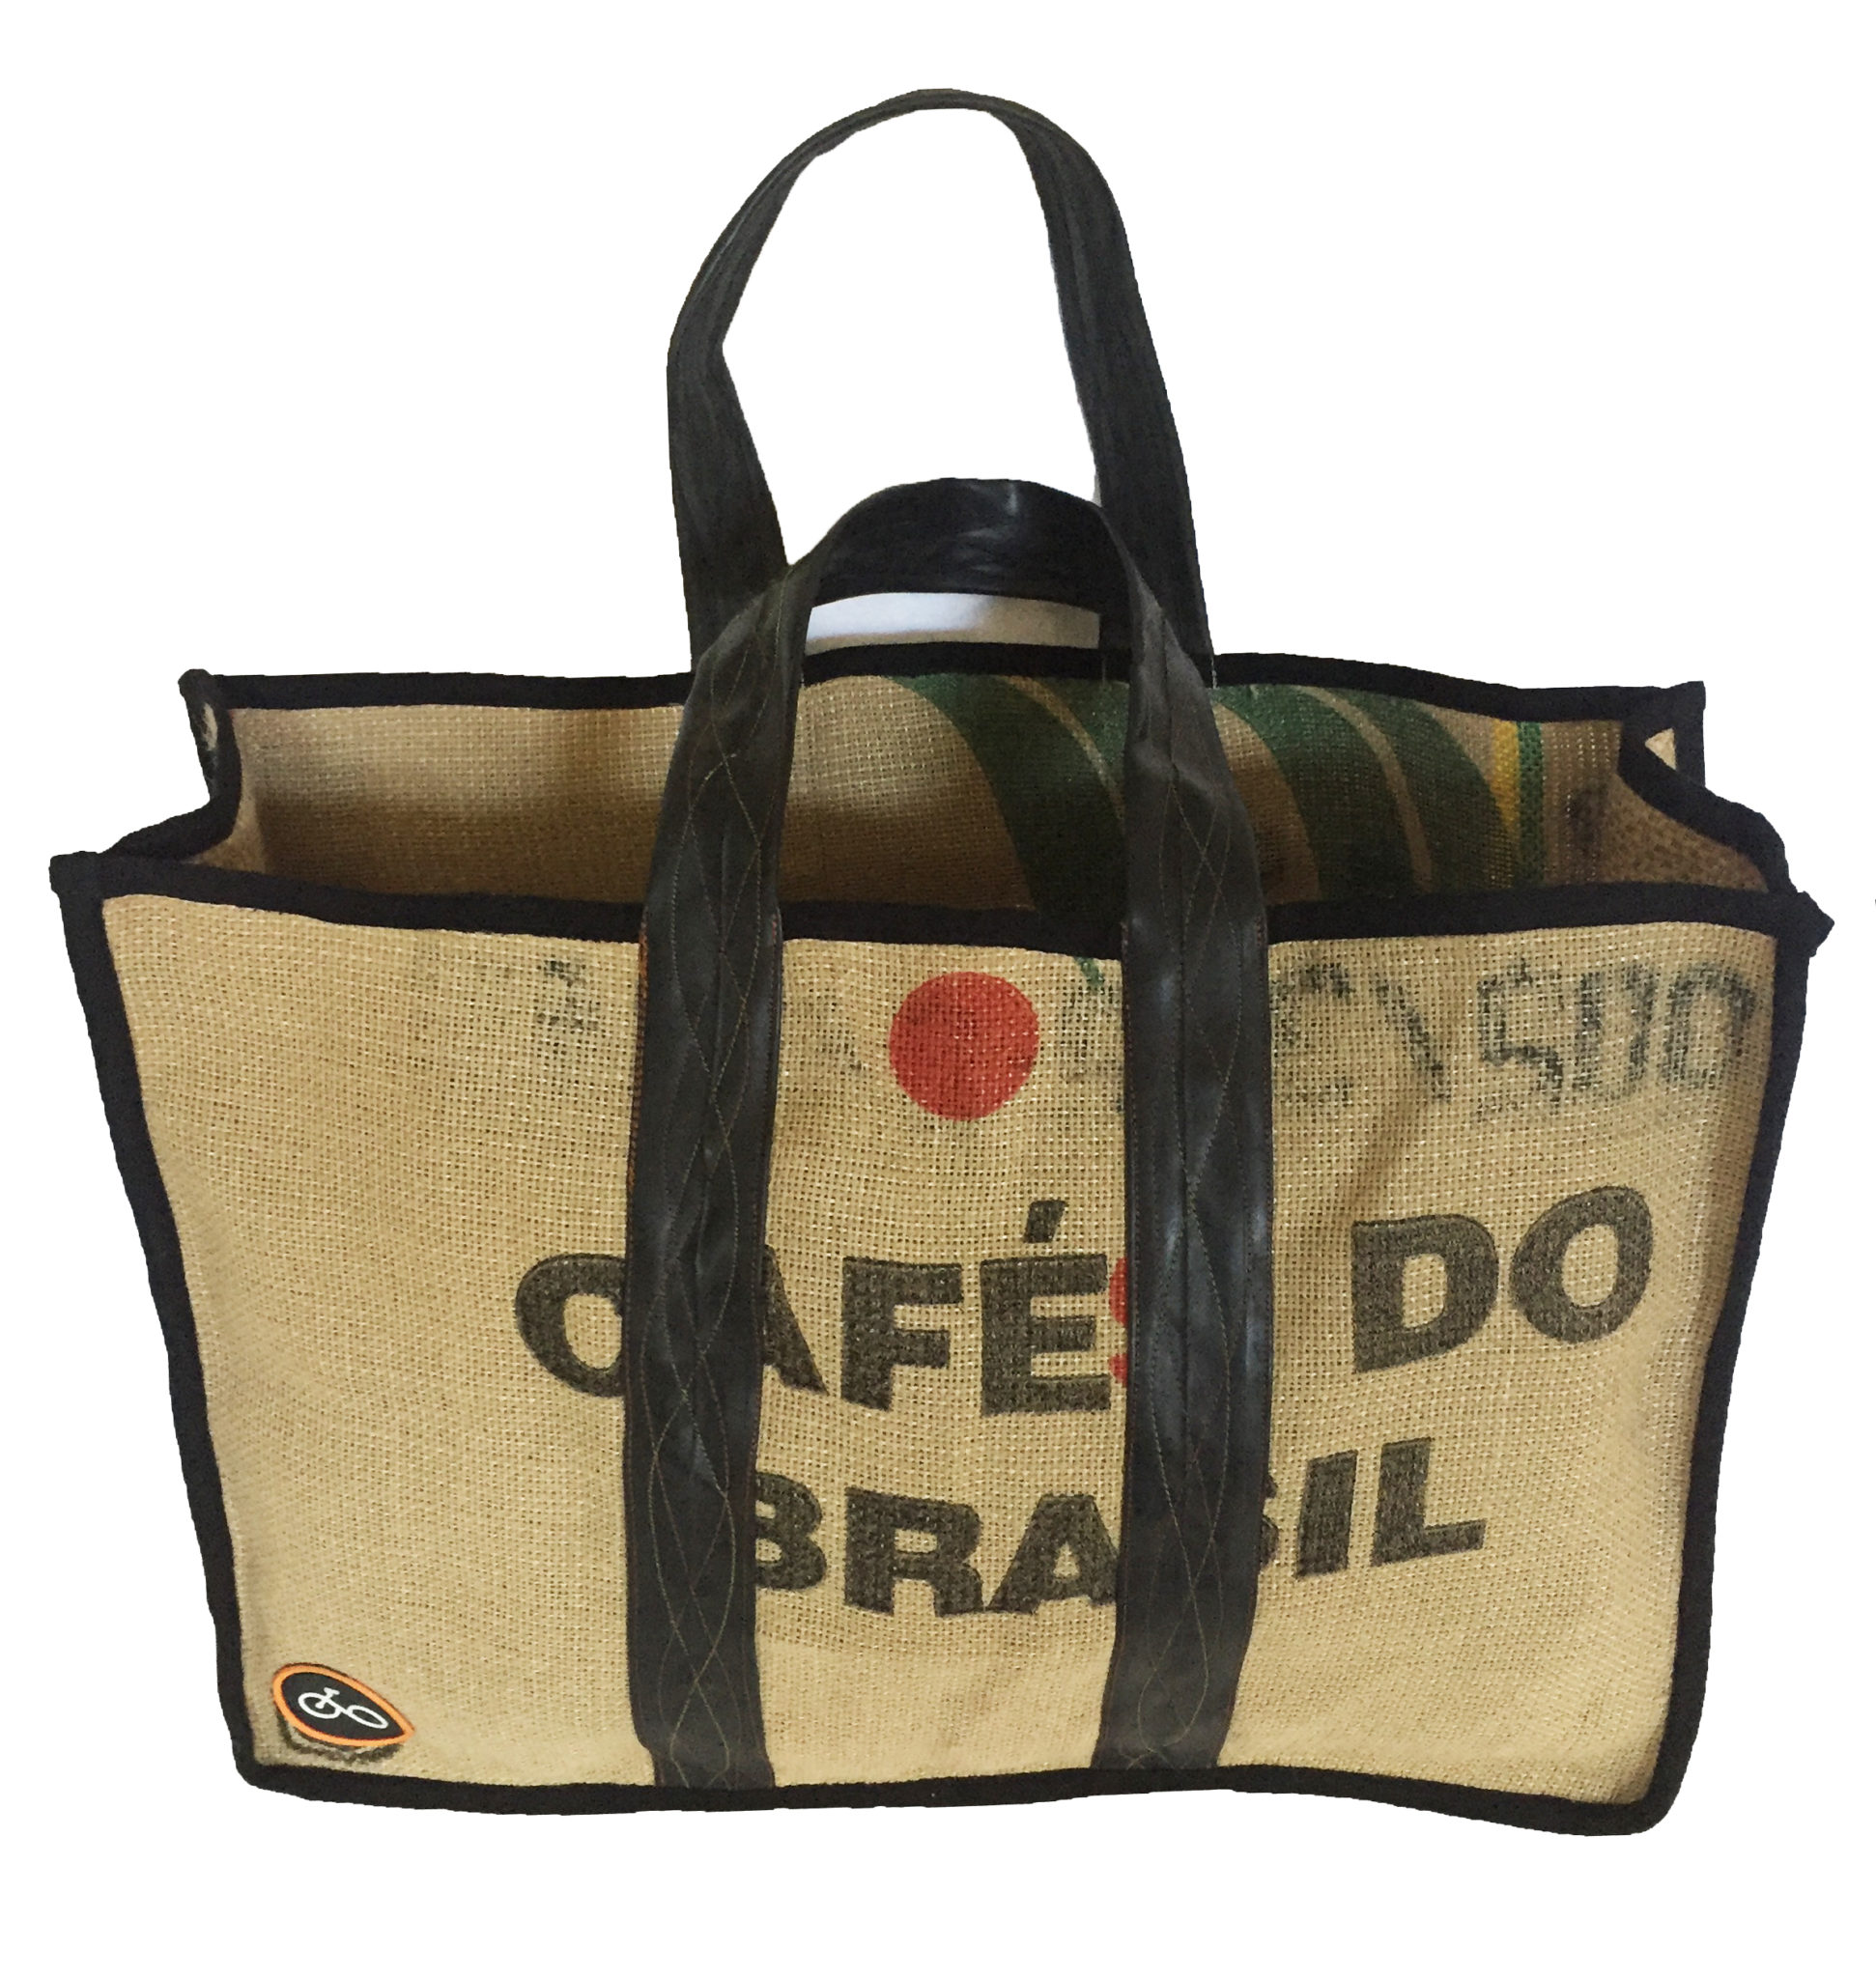 Coffee sack duffel purse